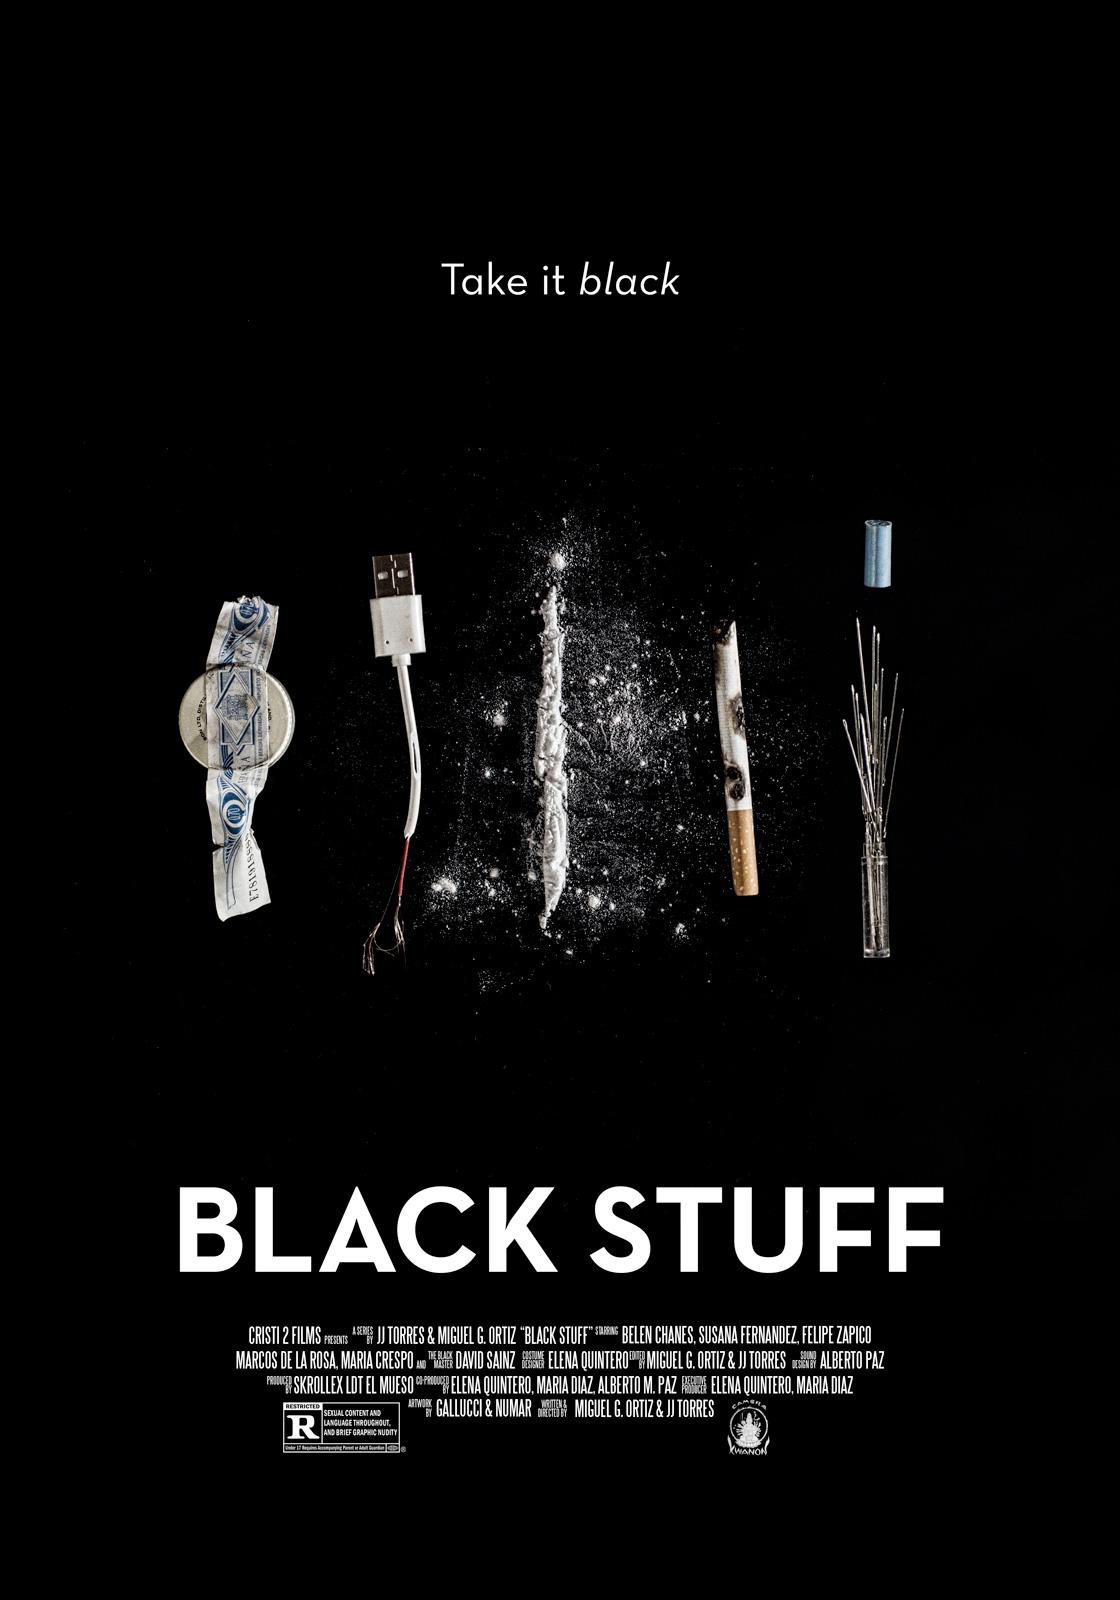 Black-Staff-01